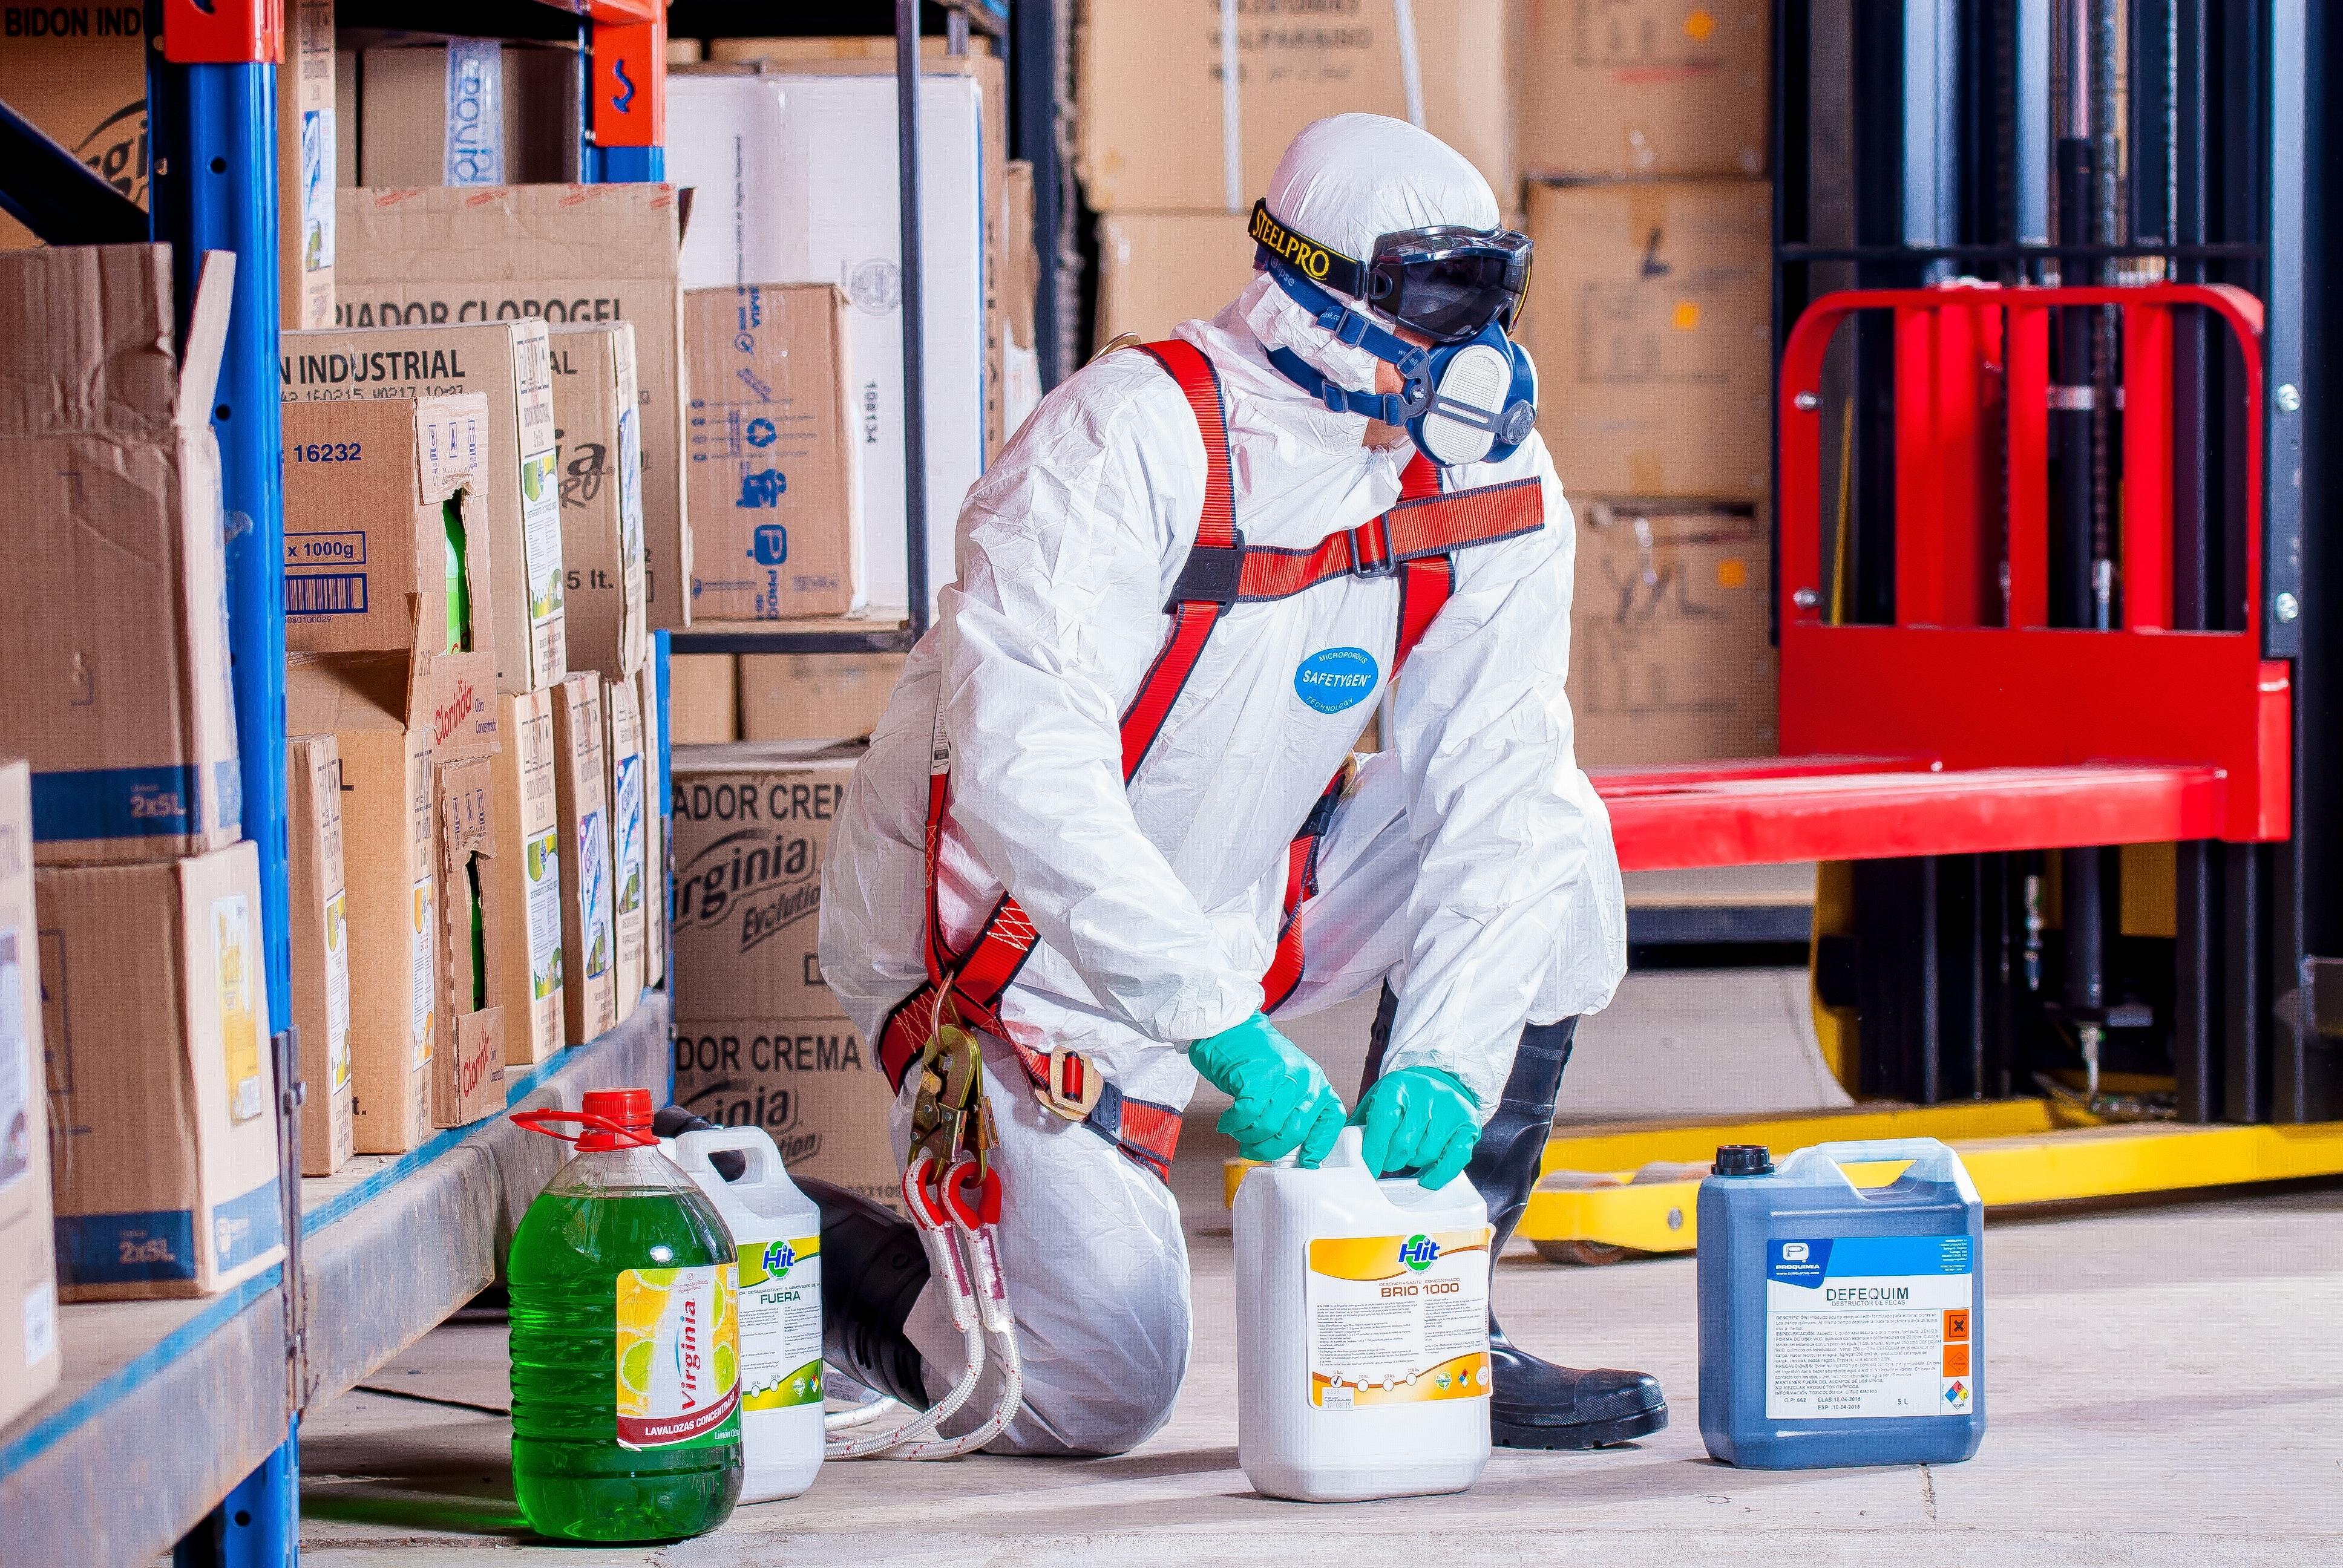 Riscuri generate de prezenta agentilor chimici periculosi